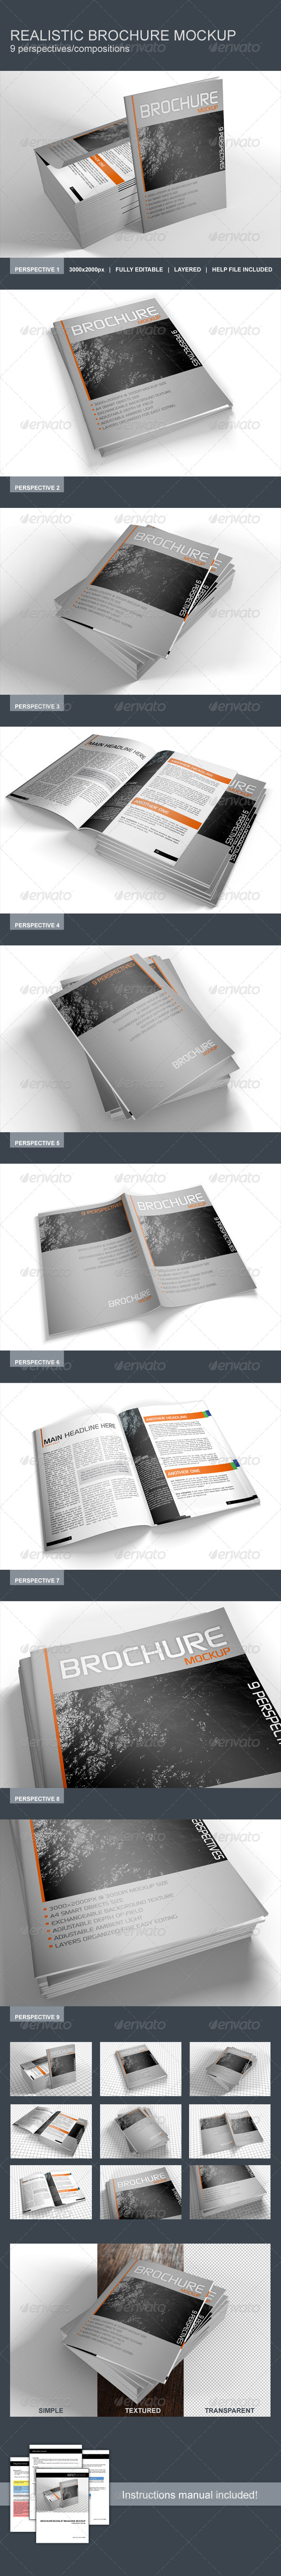 GraphicRiver Realistic Brochure Booklet Magazine Mockup 8645814